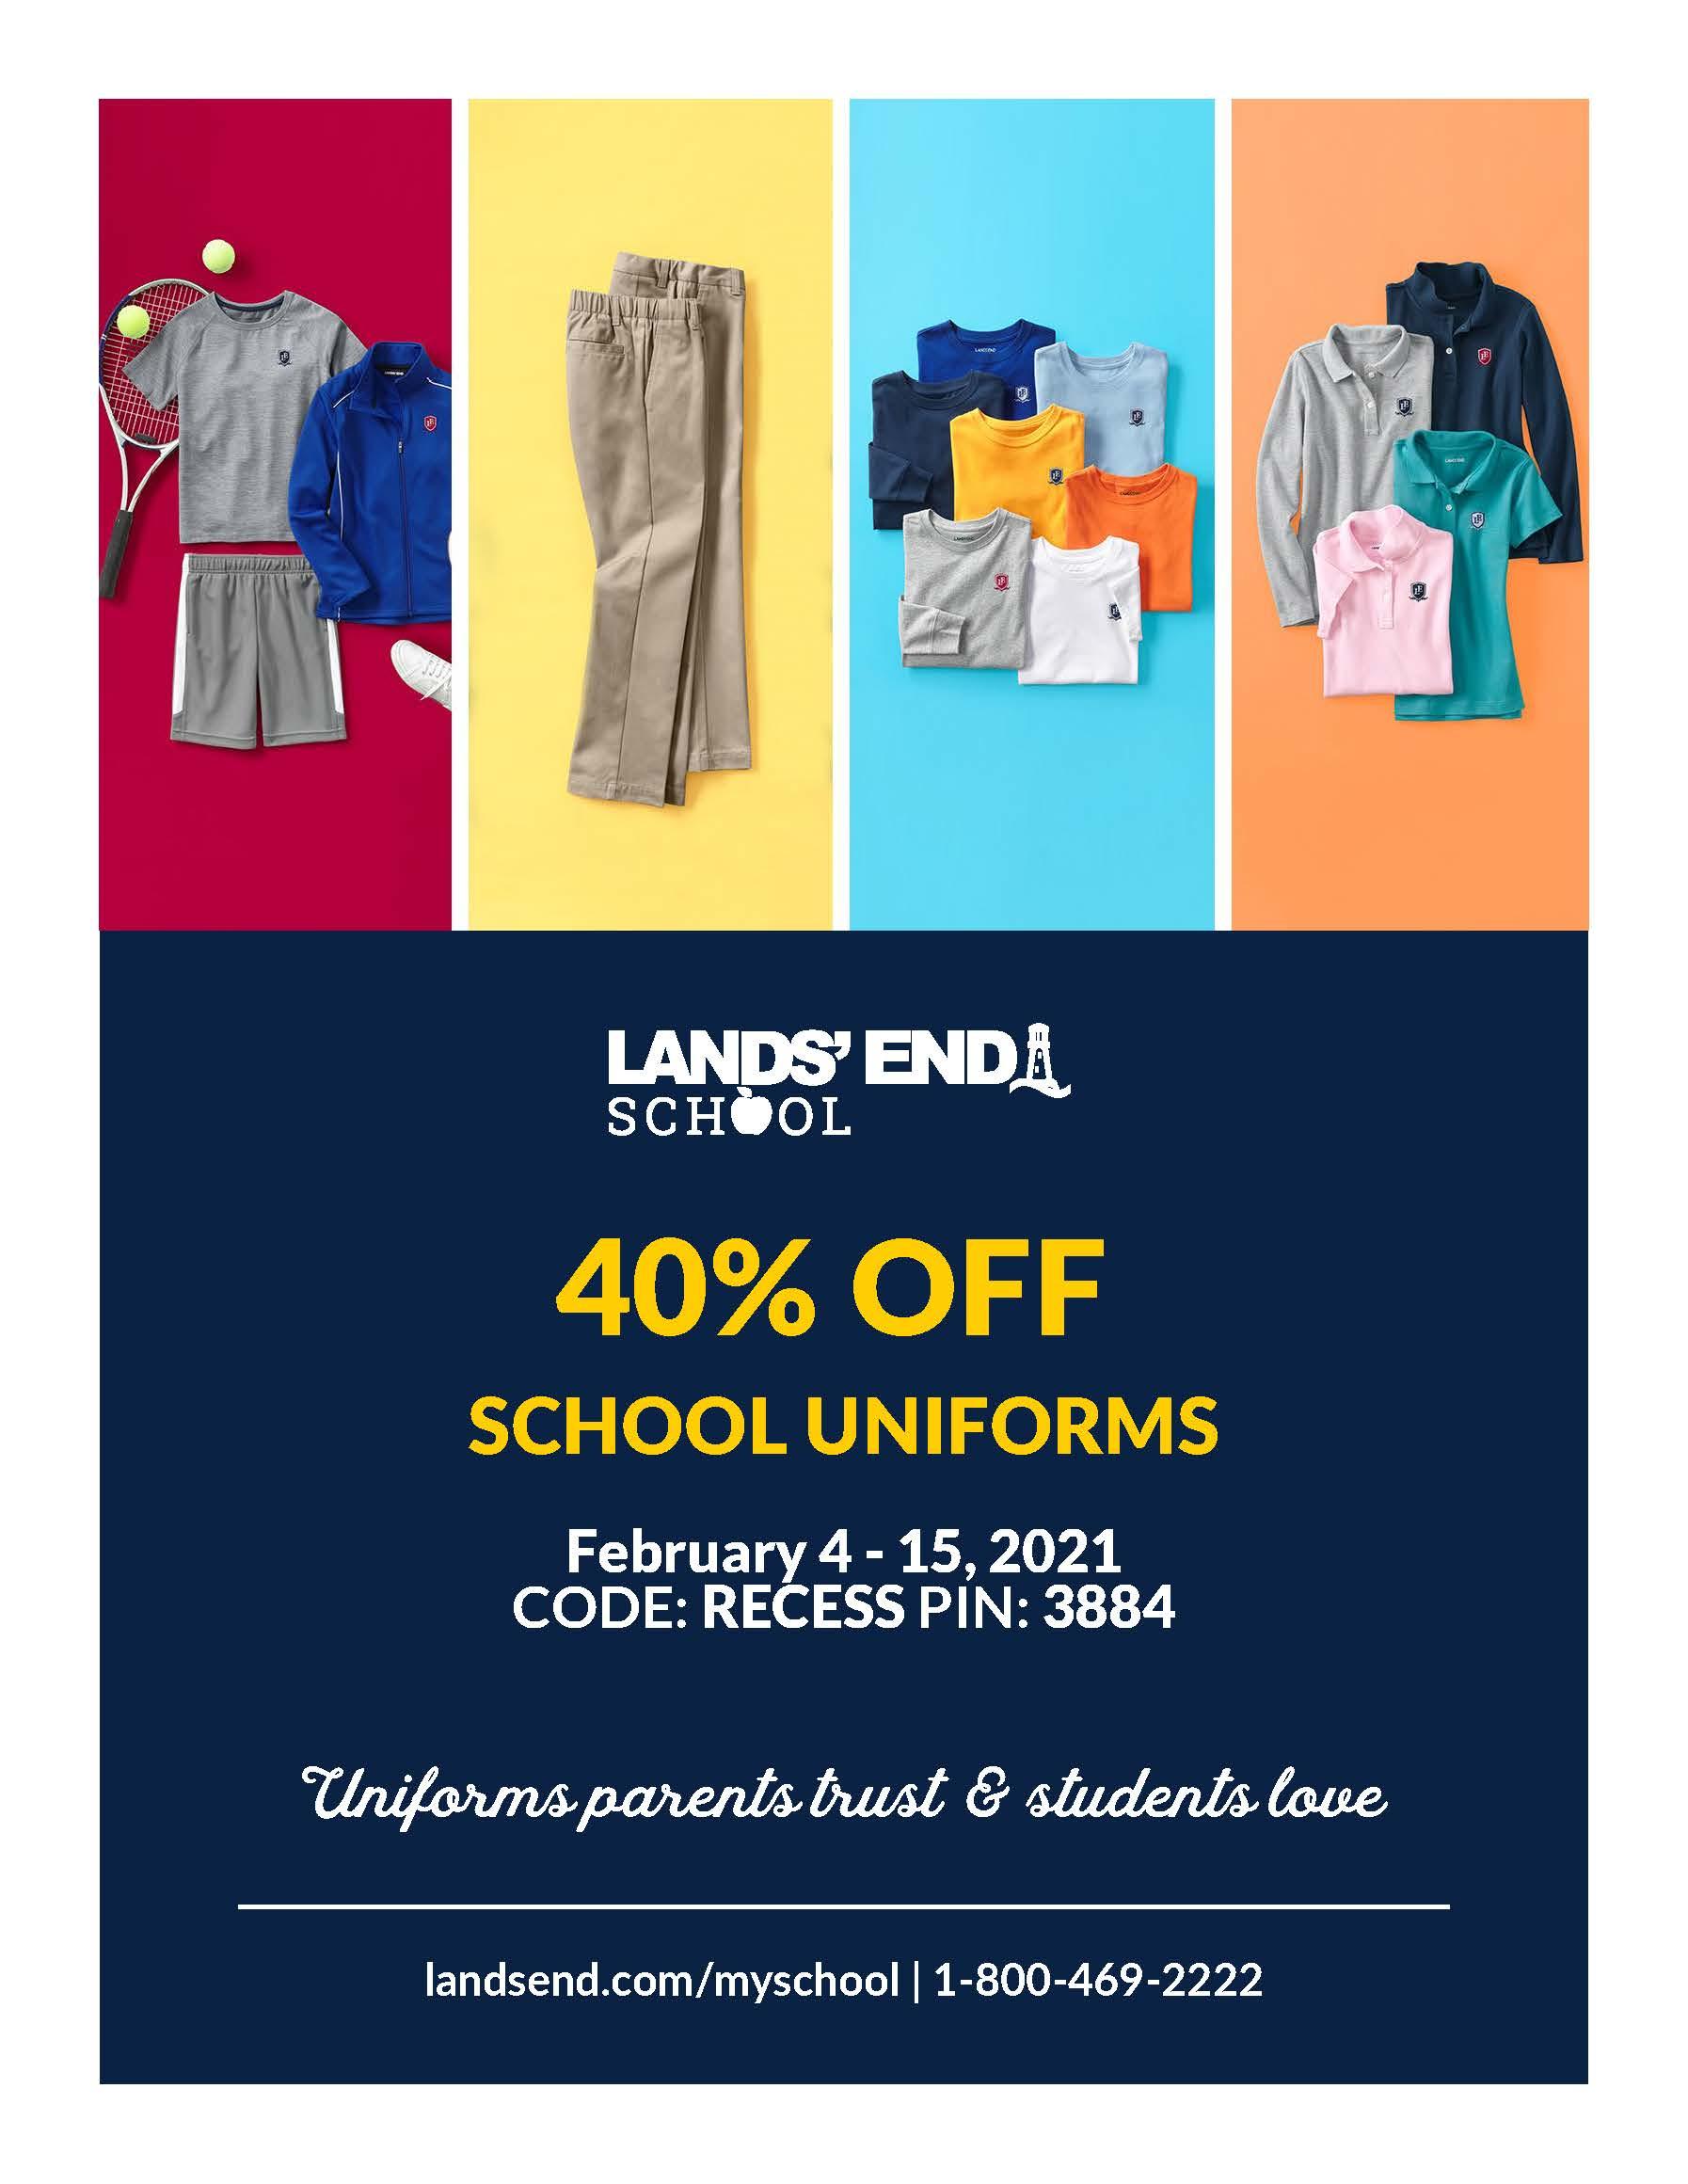 Christian Academy School System | Lands' End School Uniforms | 40% OFF | February 4-15